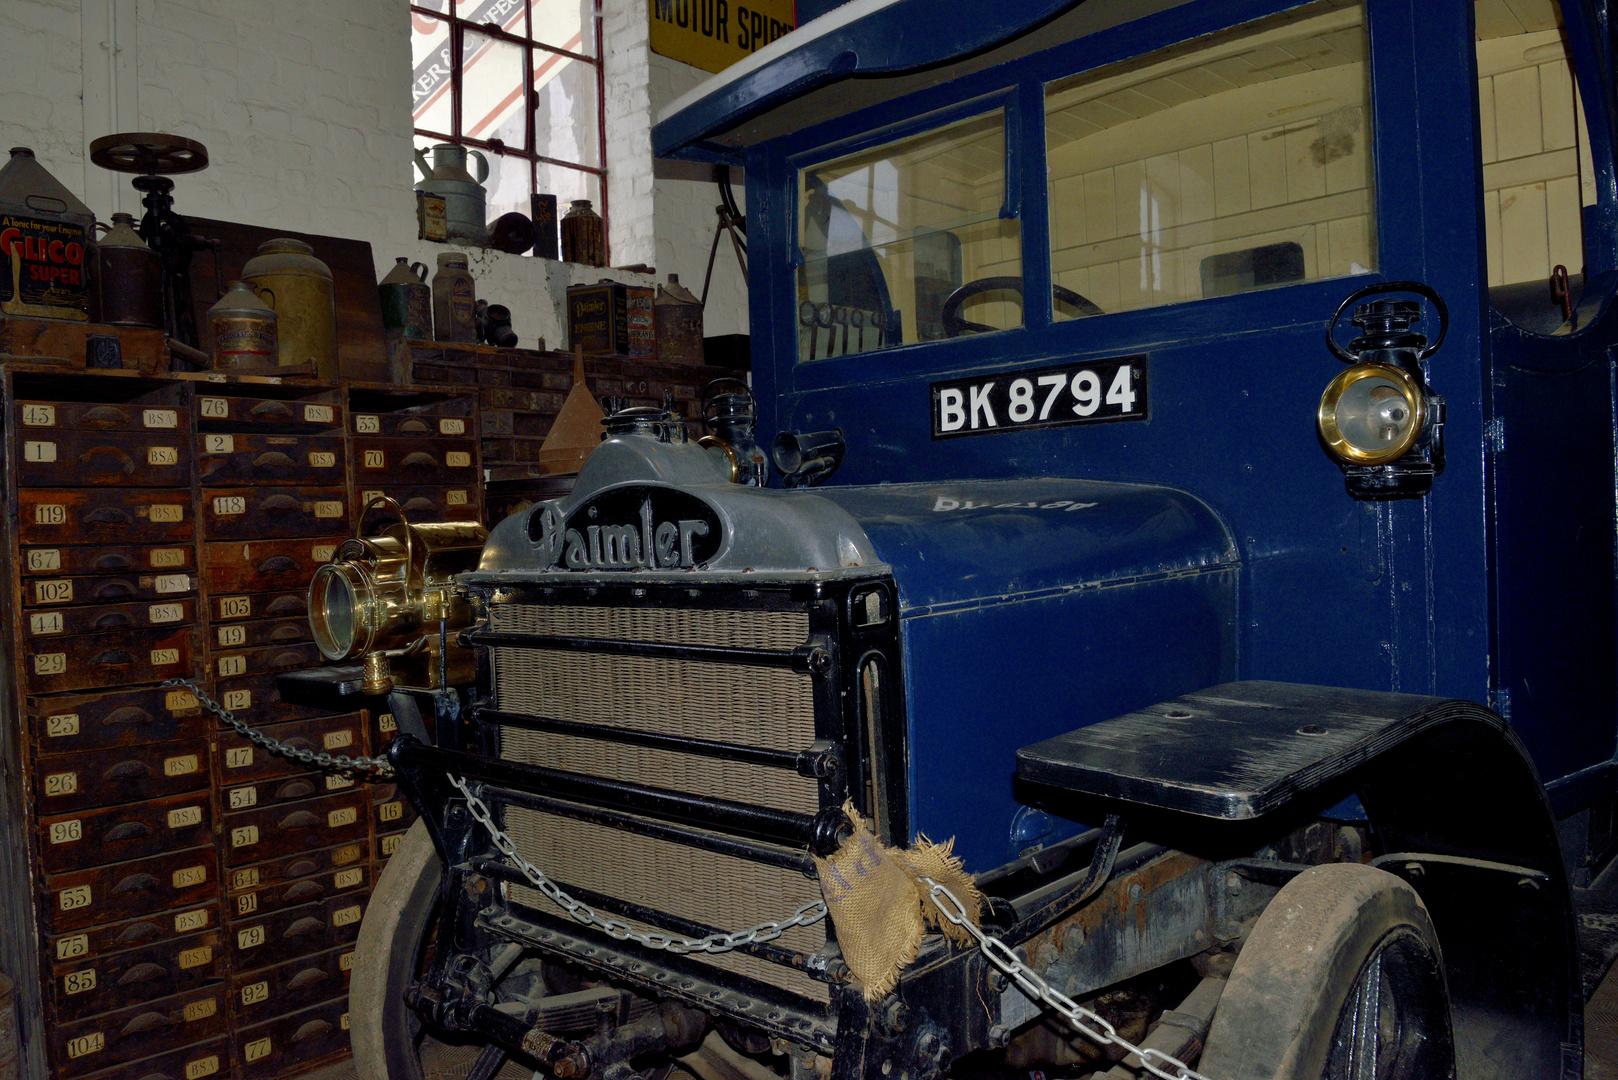 Daimler - Kulanzreparatur abgelehnt.